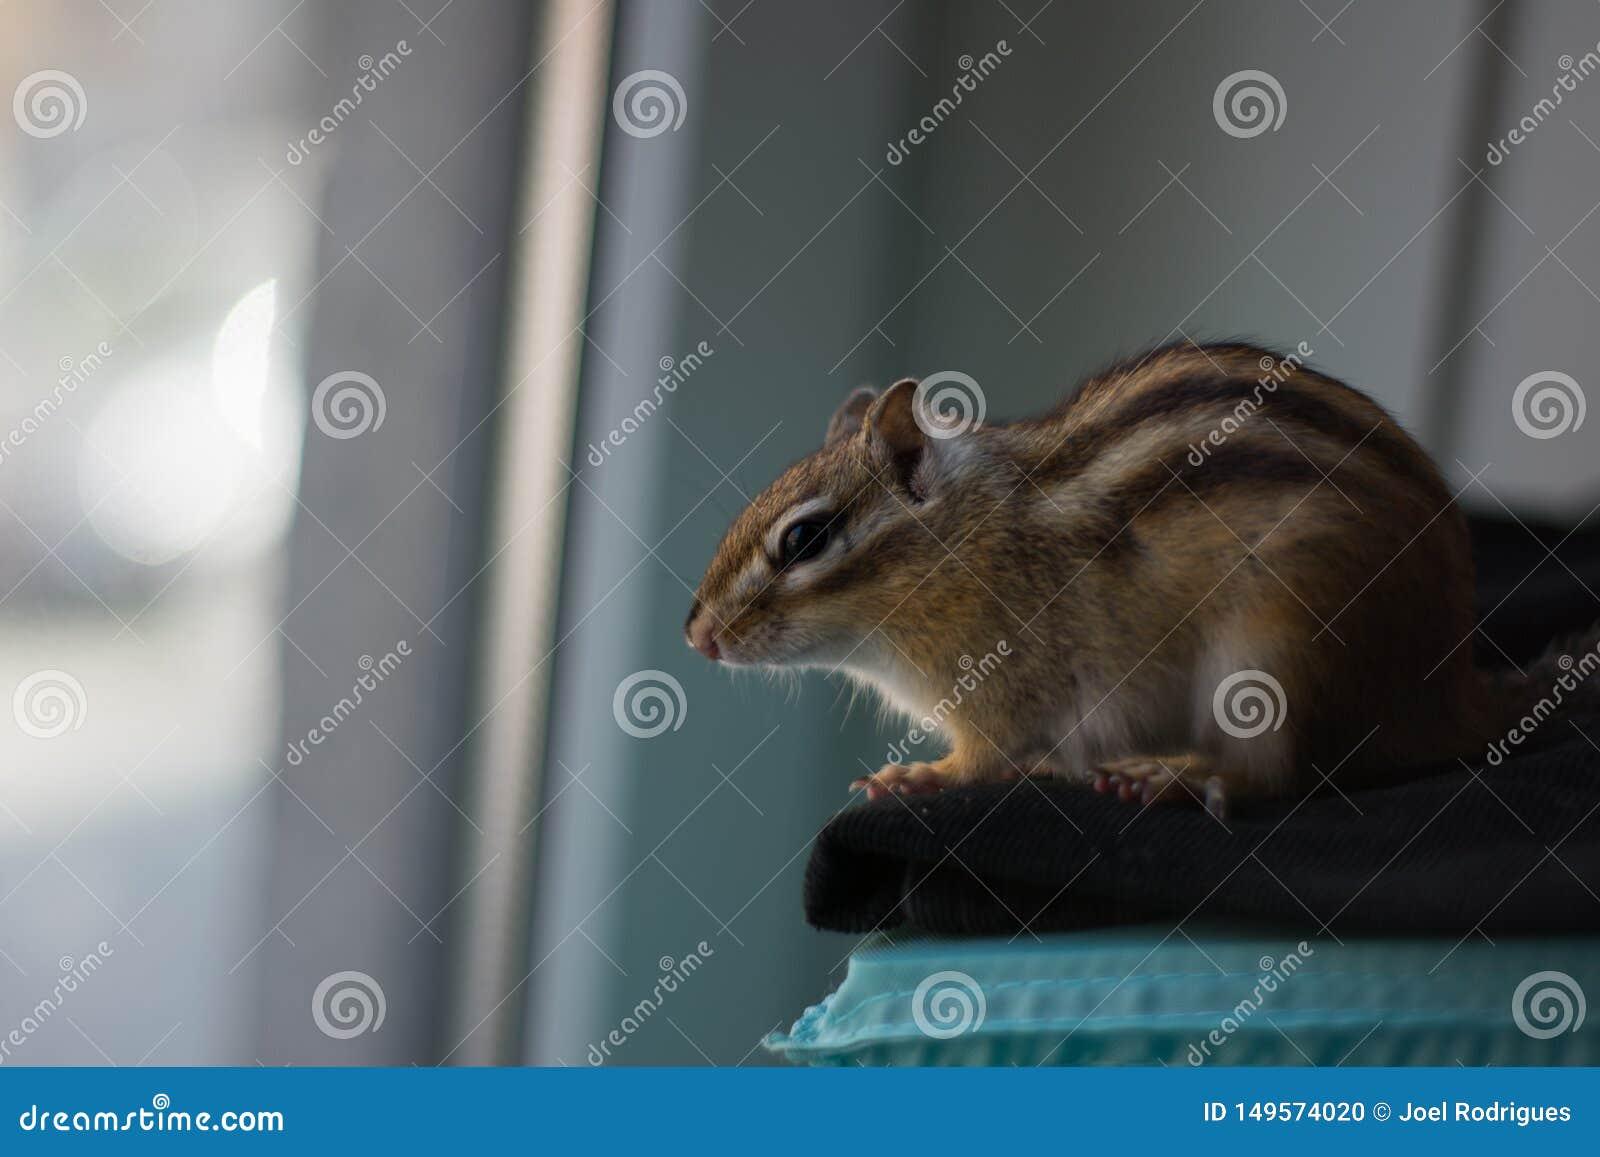 Chipmunk gapi si? z okno